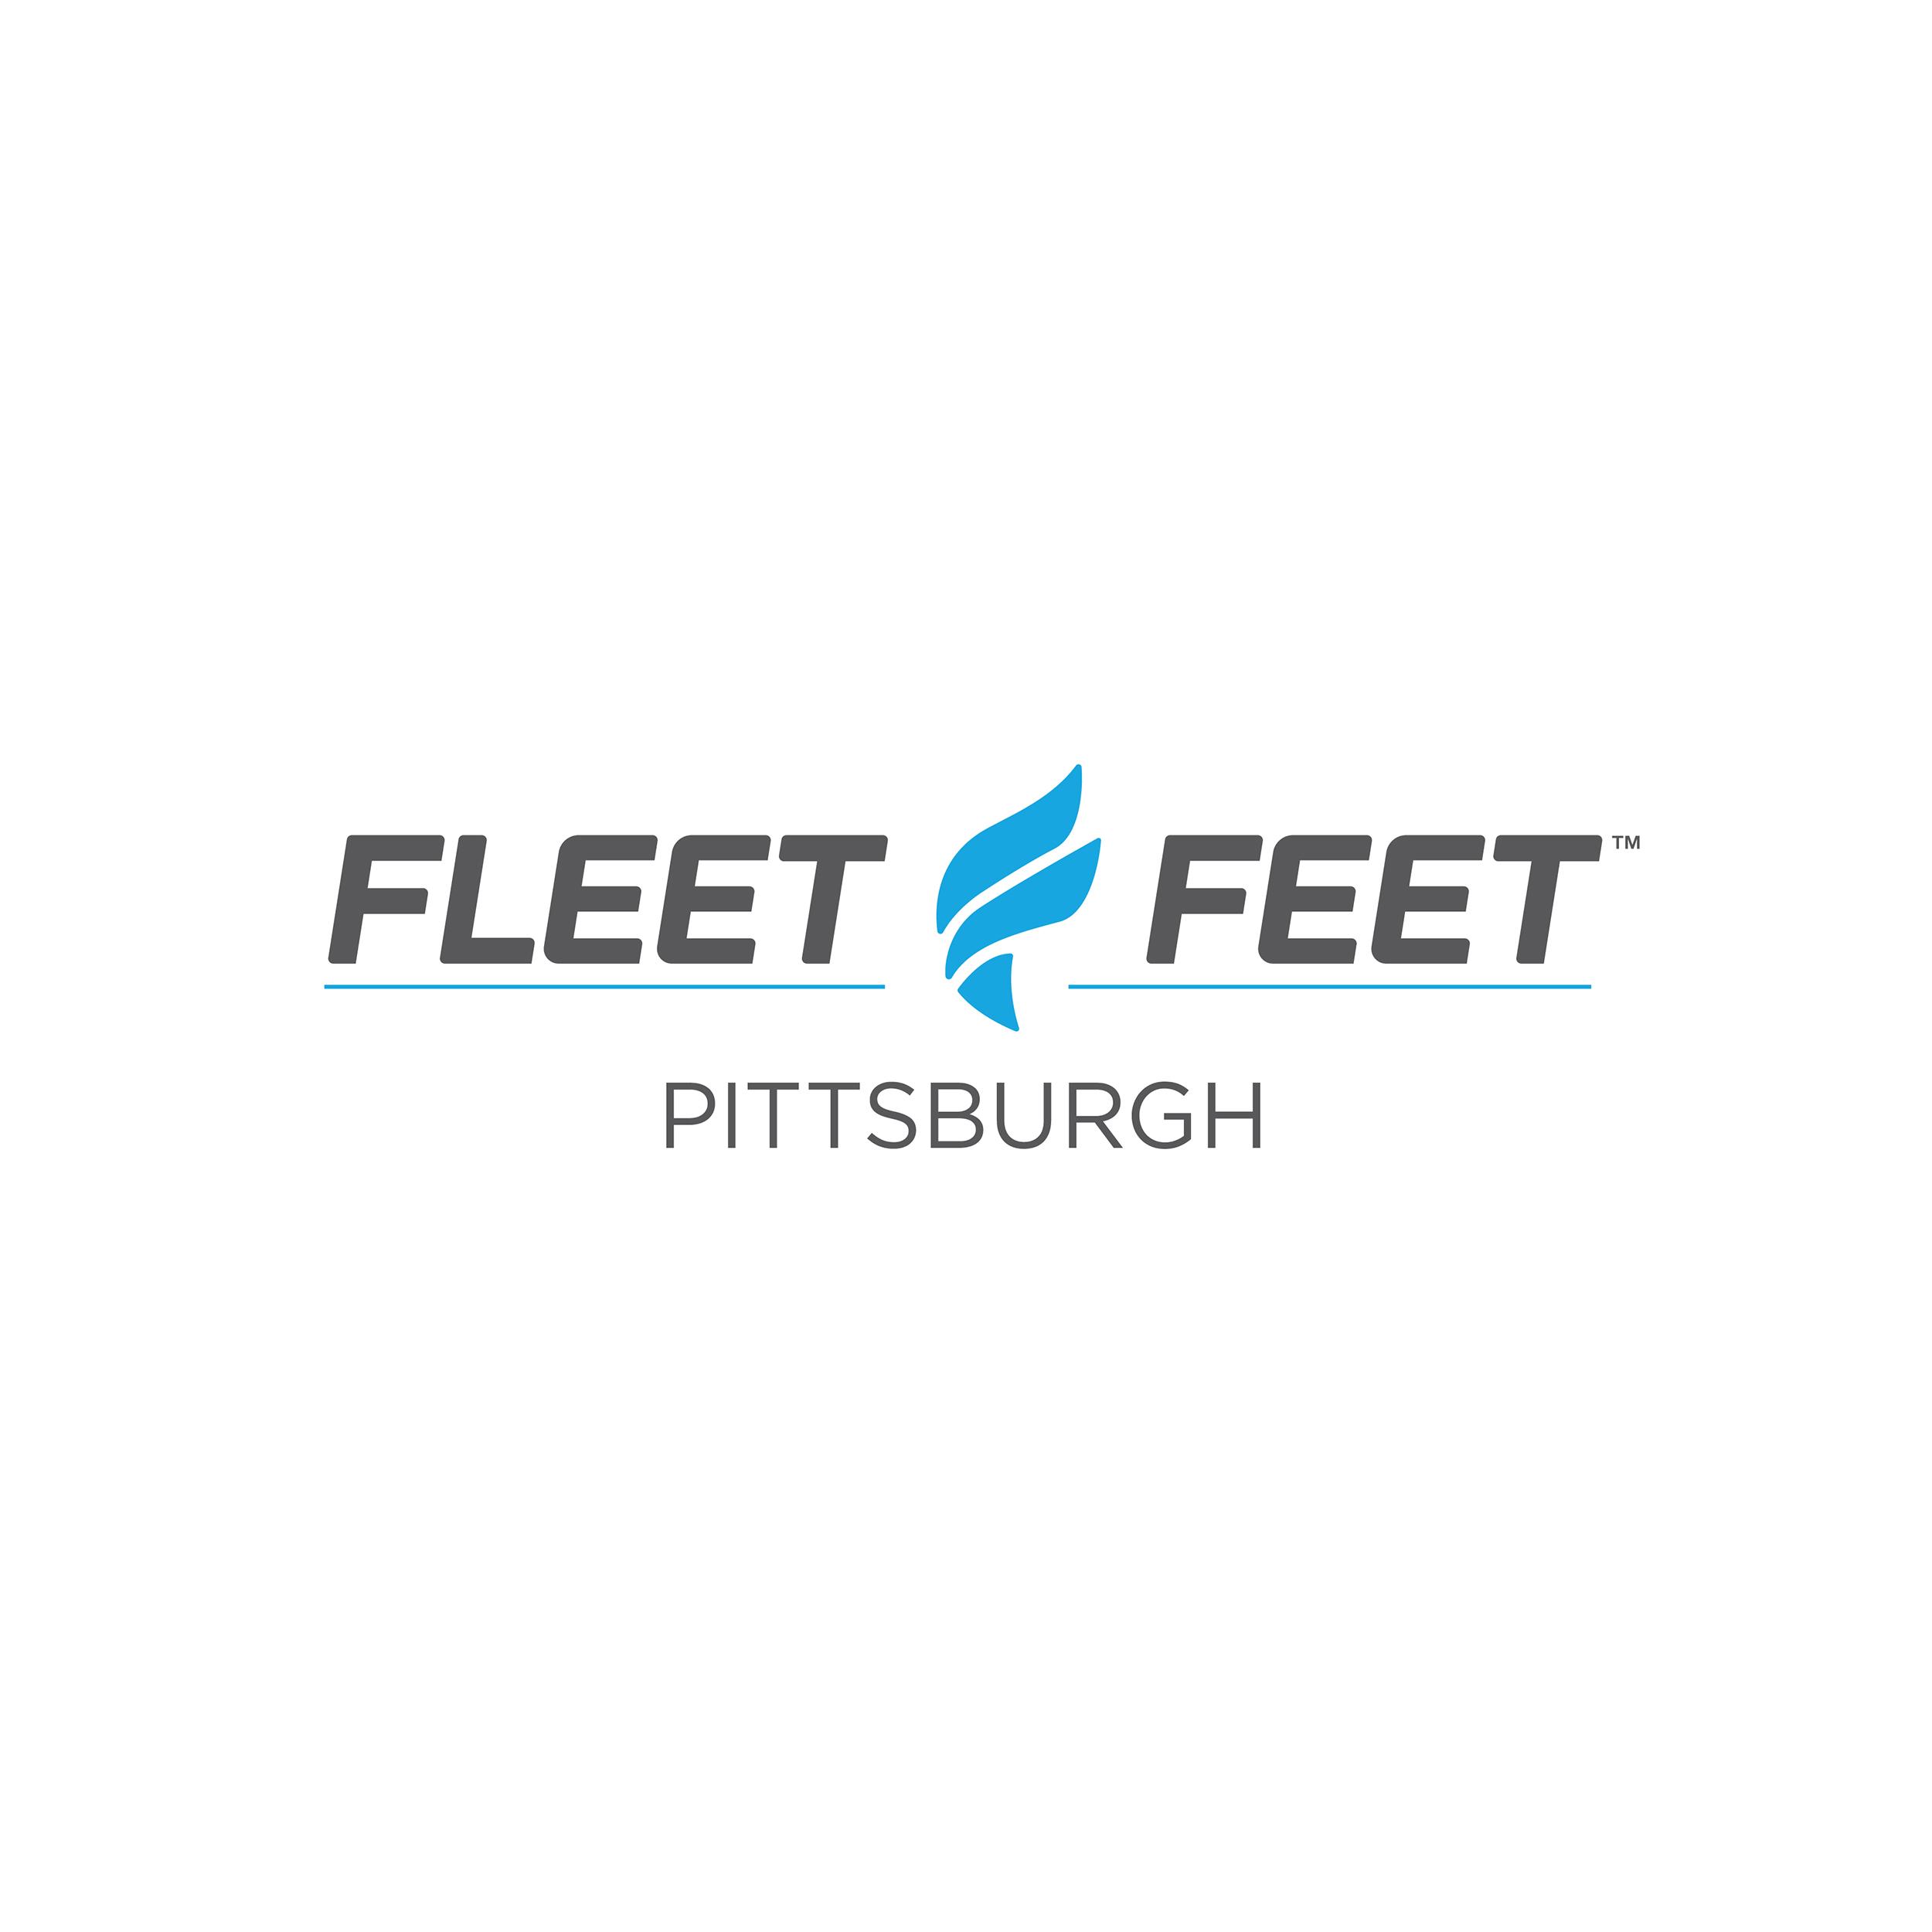 FleetFeetWebsite.jpg